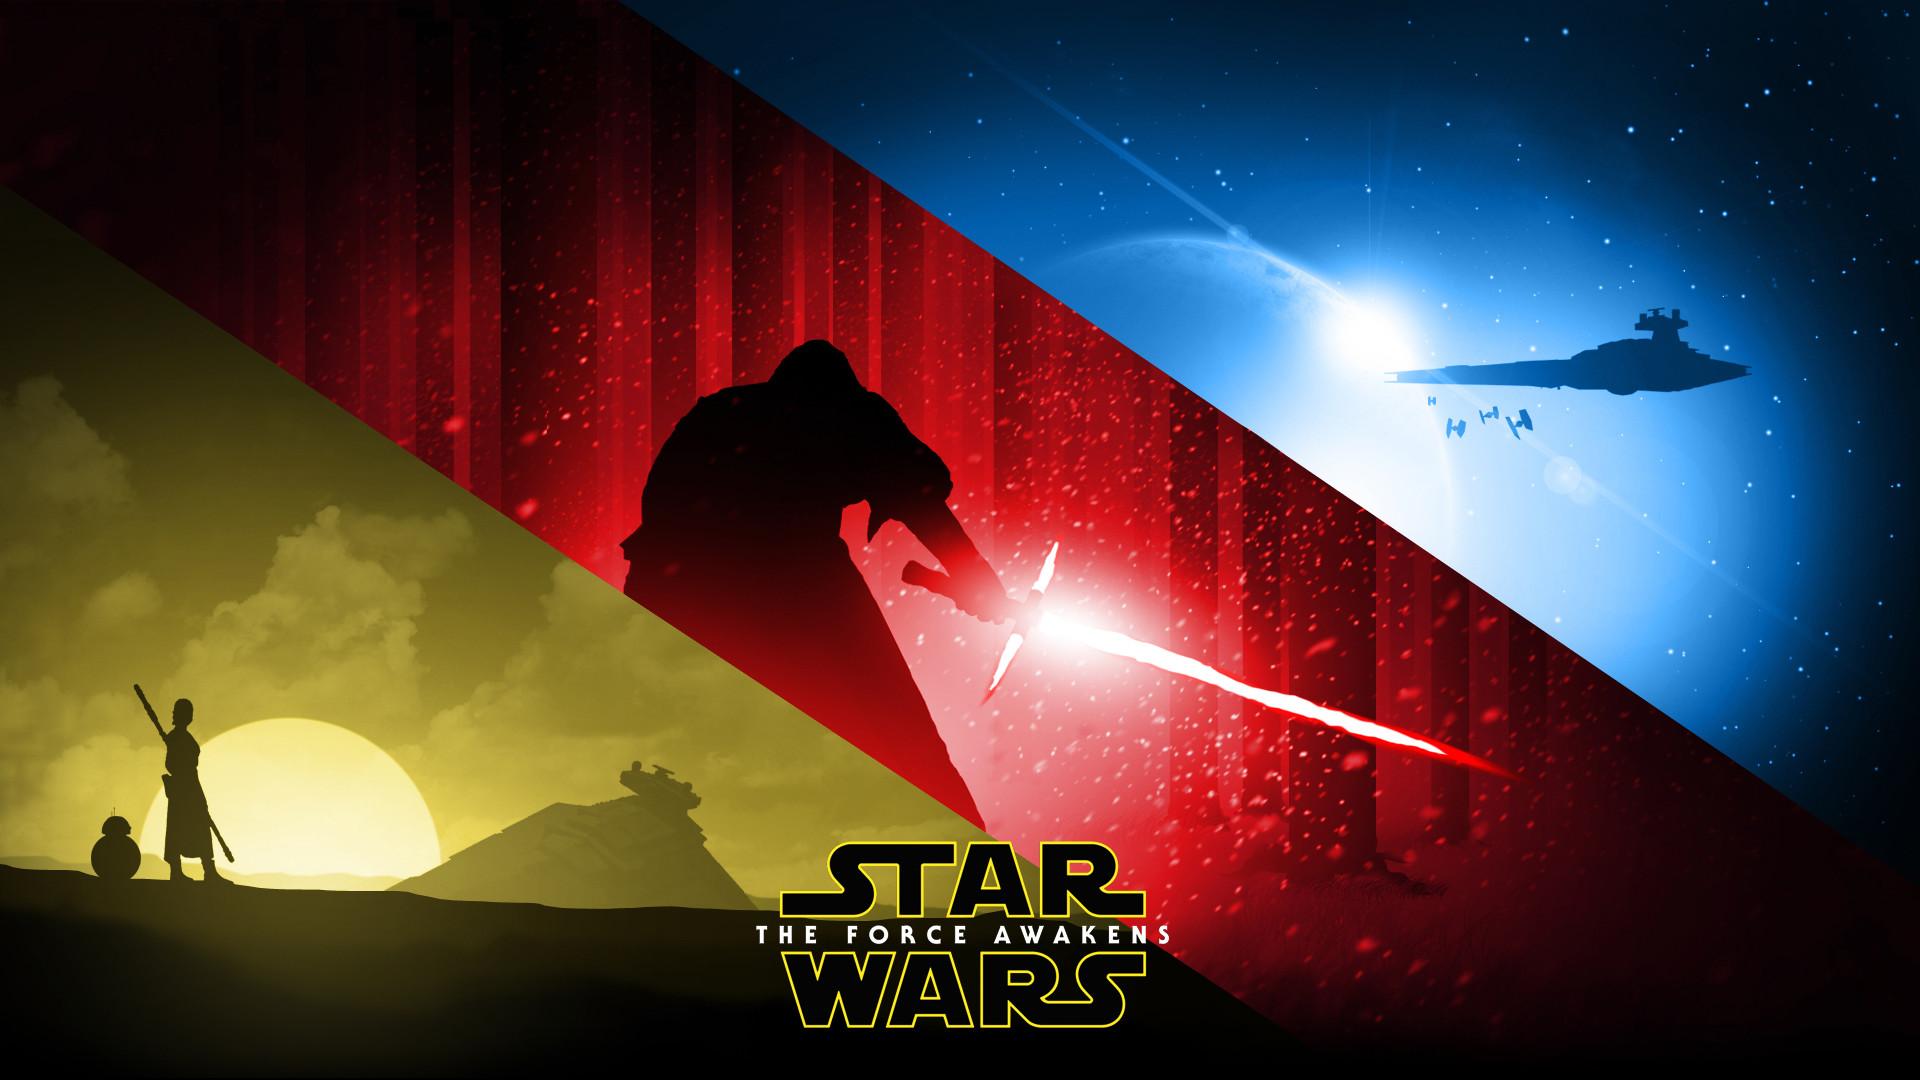 Star wars the force awakens wallpaper.